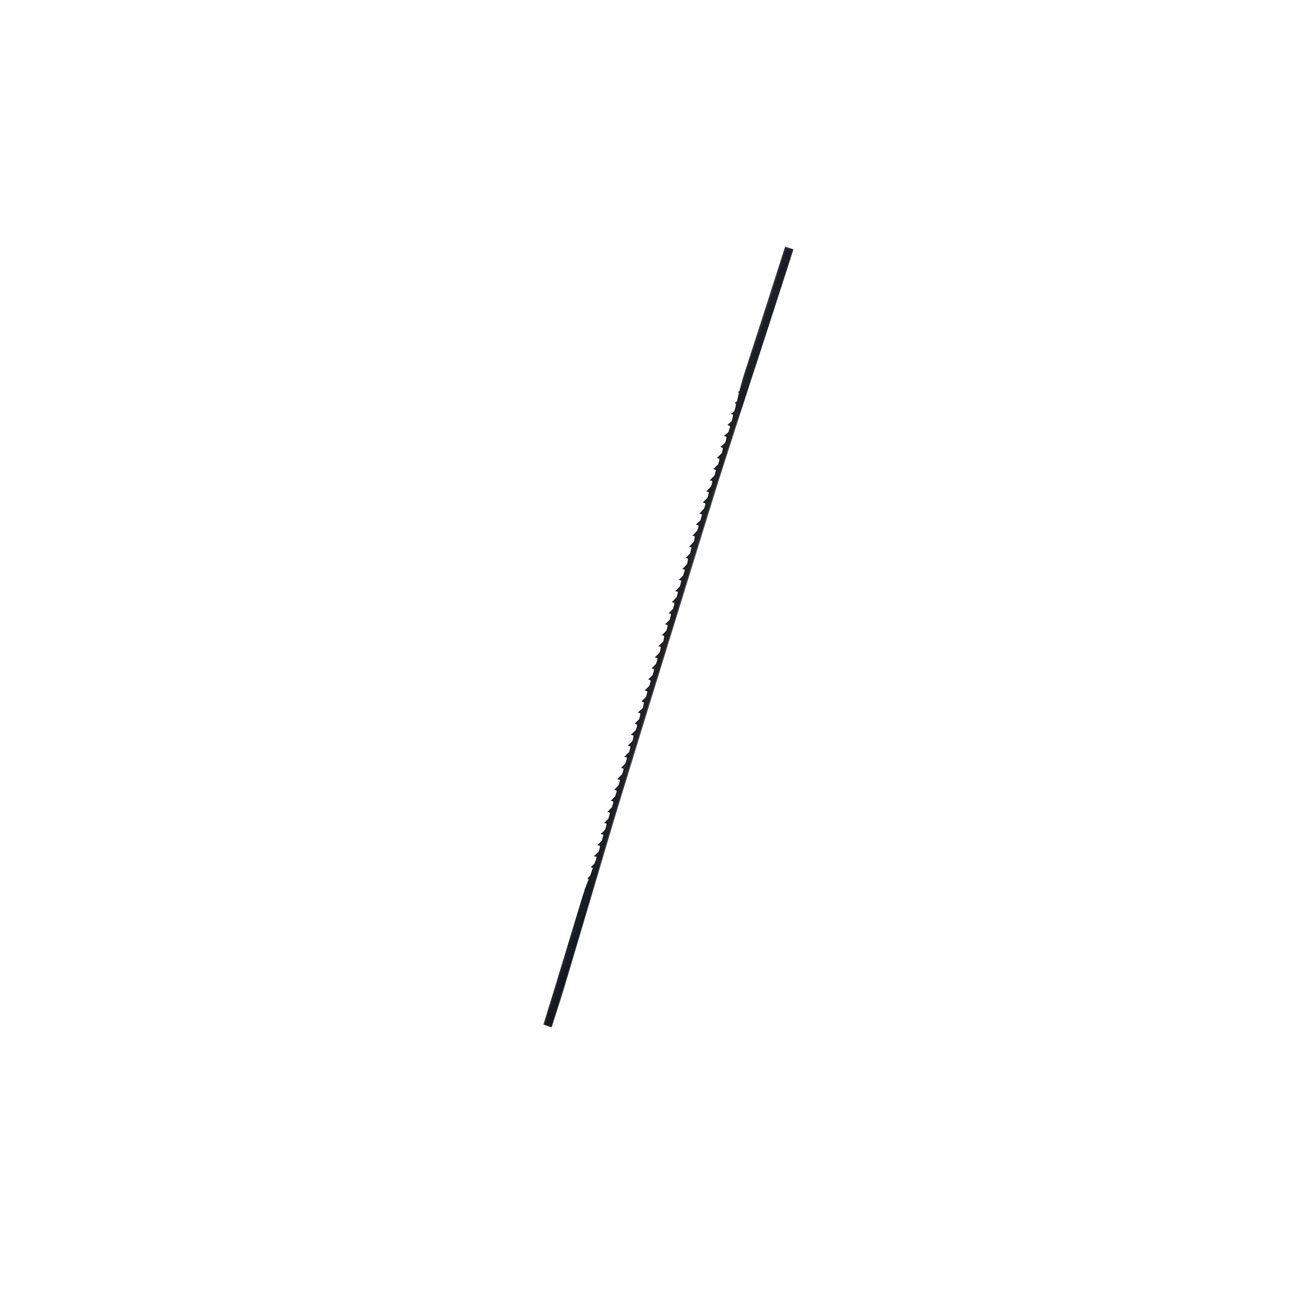 Proxxon 28116 electric Scroll Saw Blades